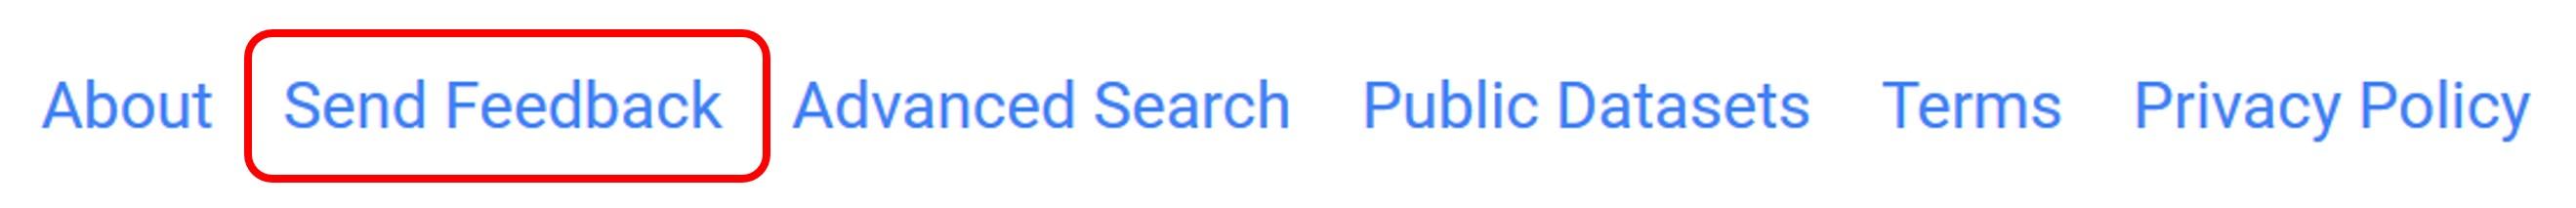 "Google Patents ""Send Feedback"" Link"